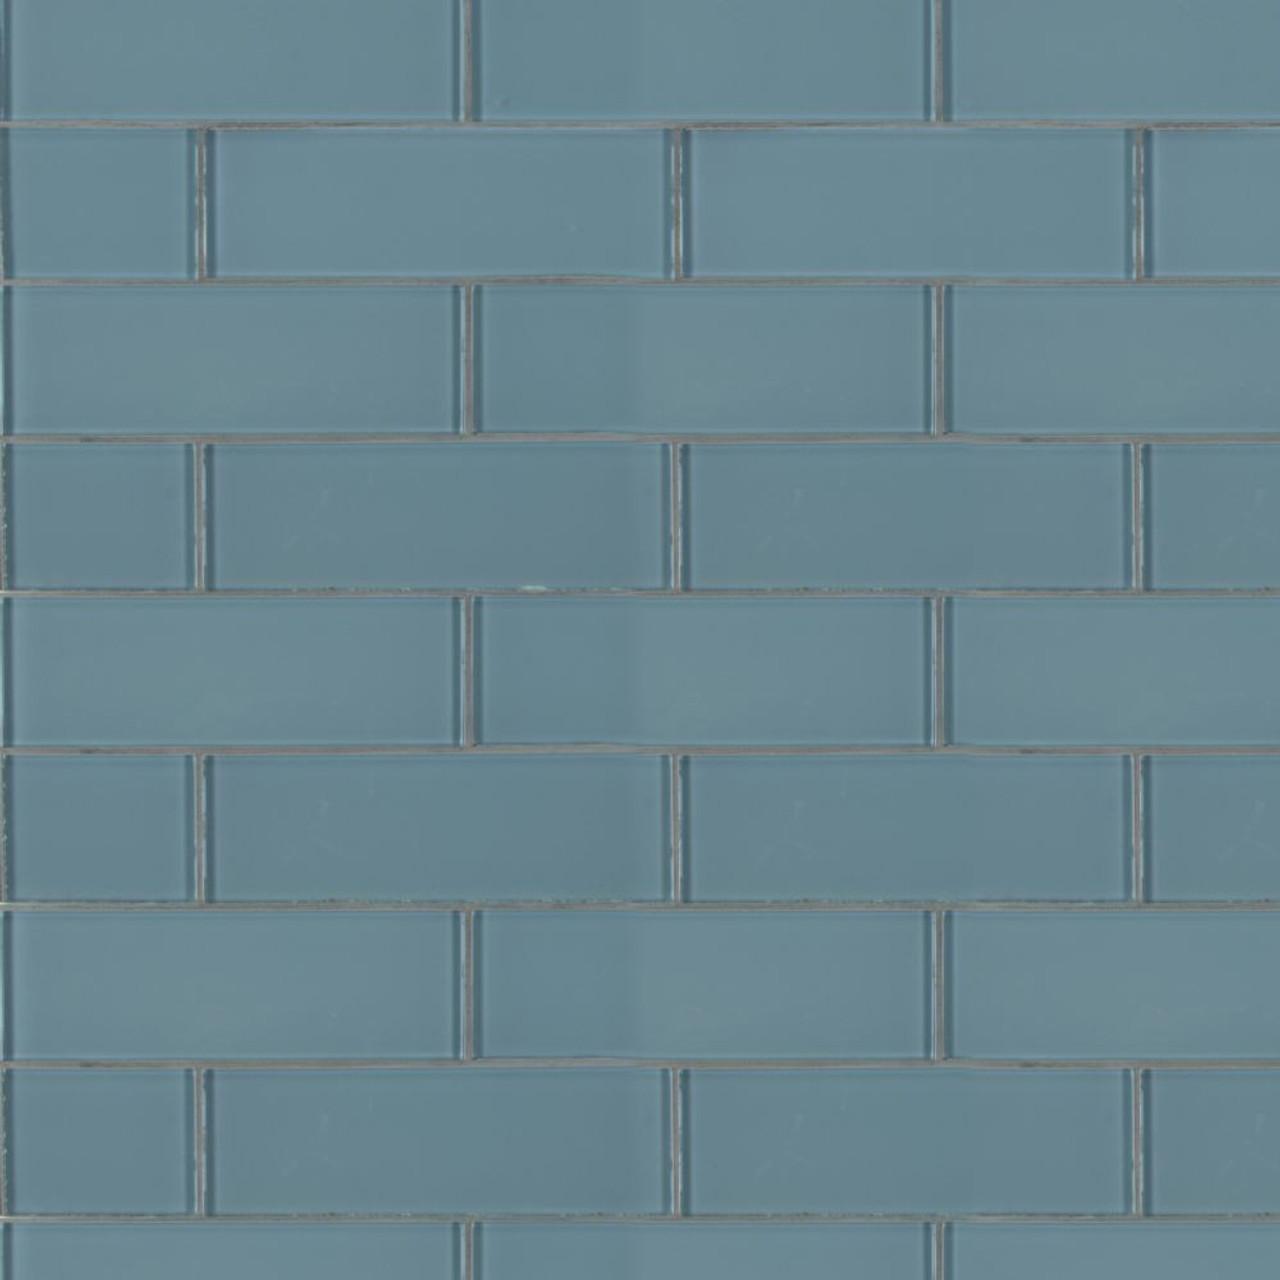 ms international glass tile series harbor gray 3x9 backsplash glass subway tile smot gl t hagr39